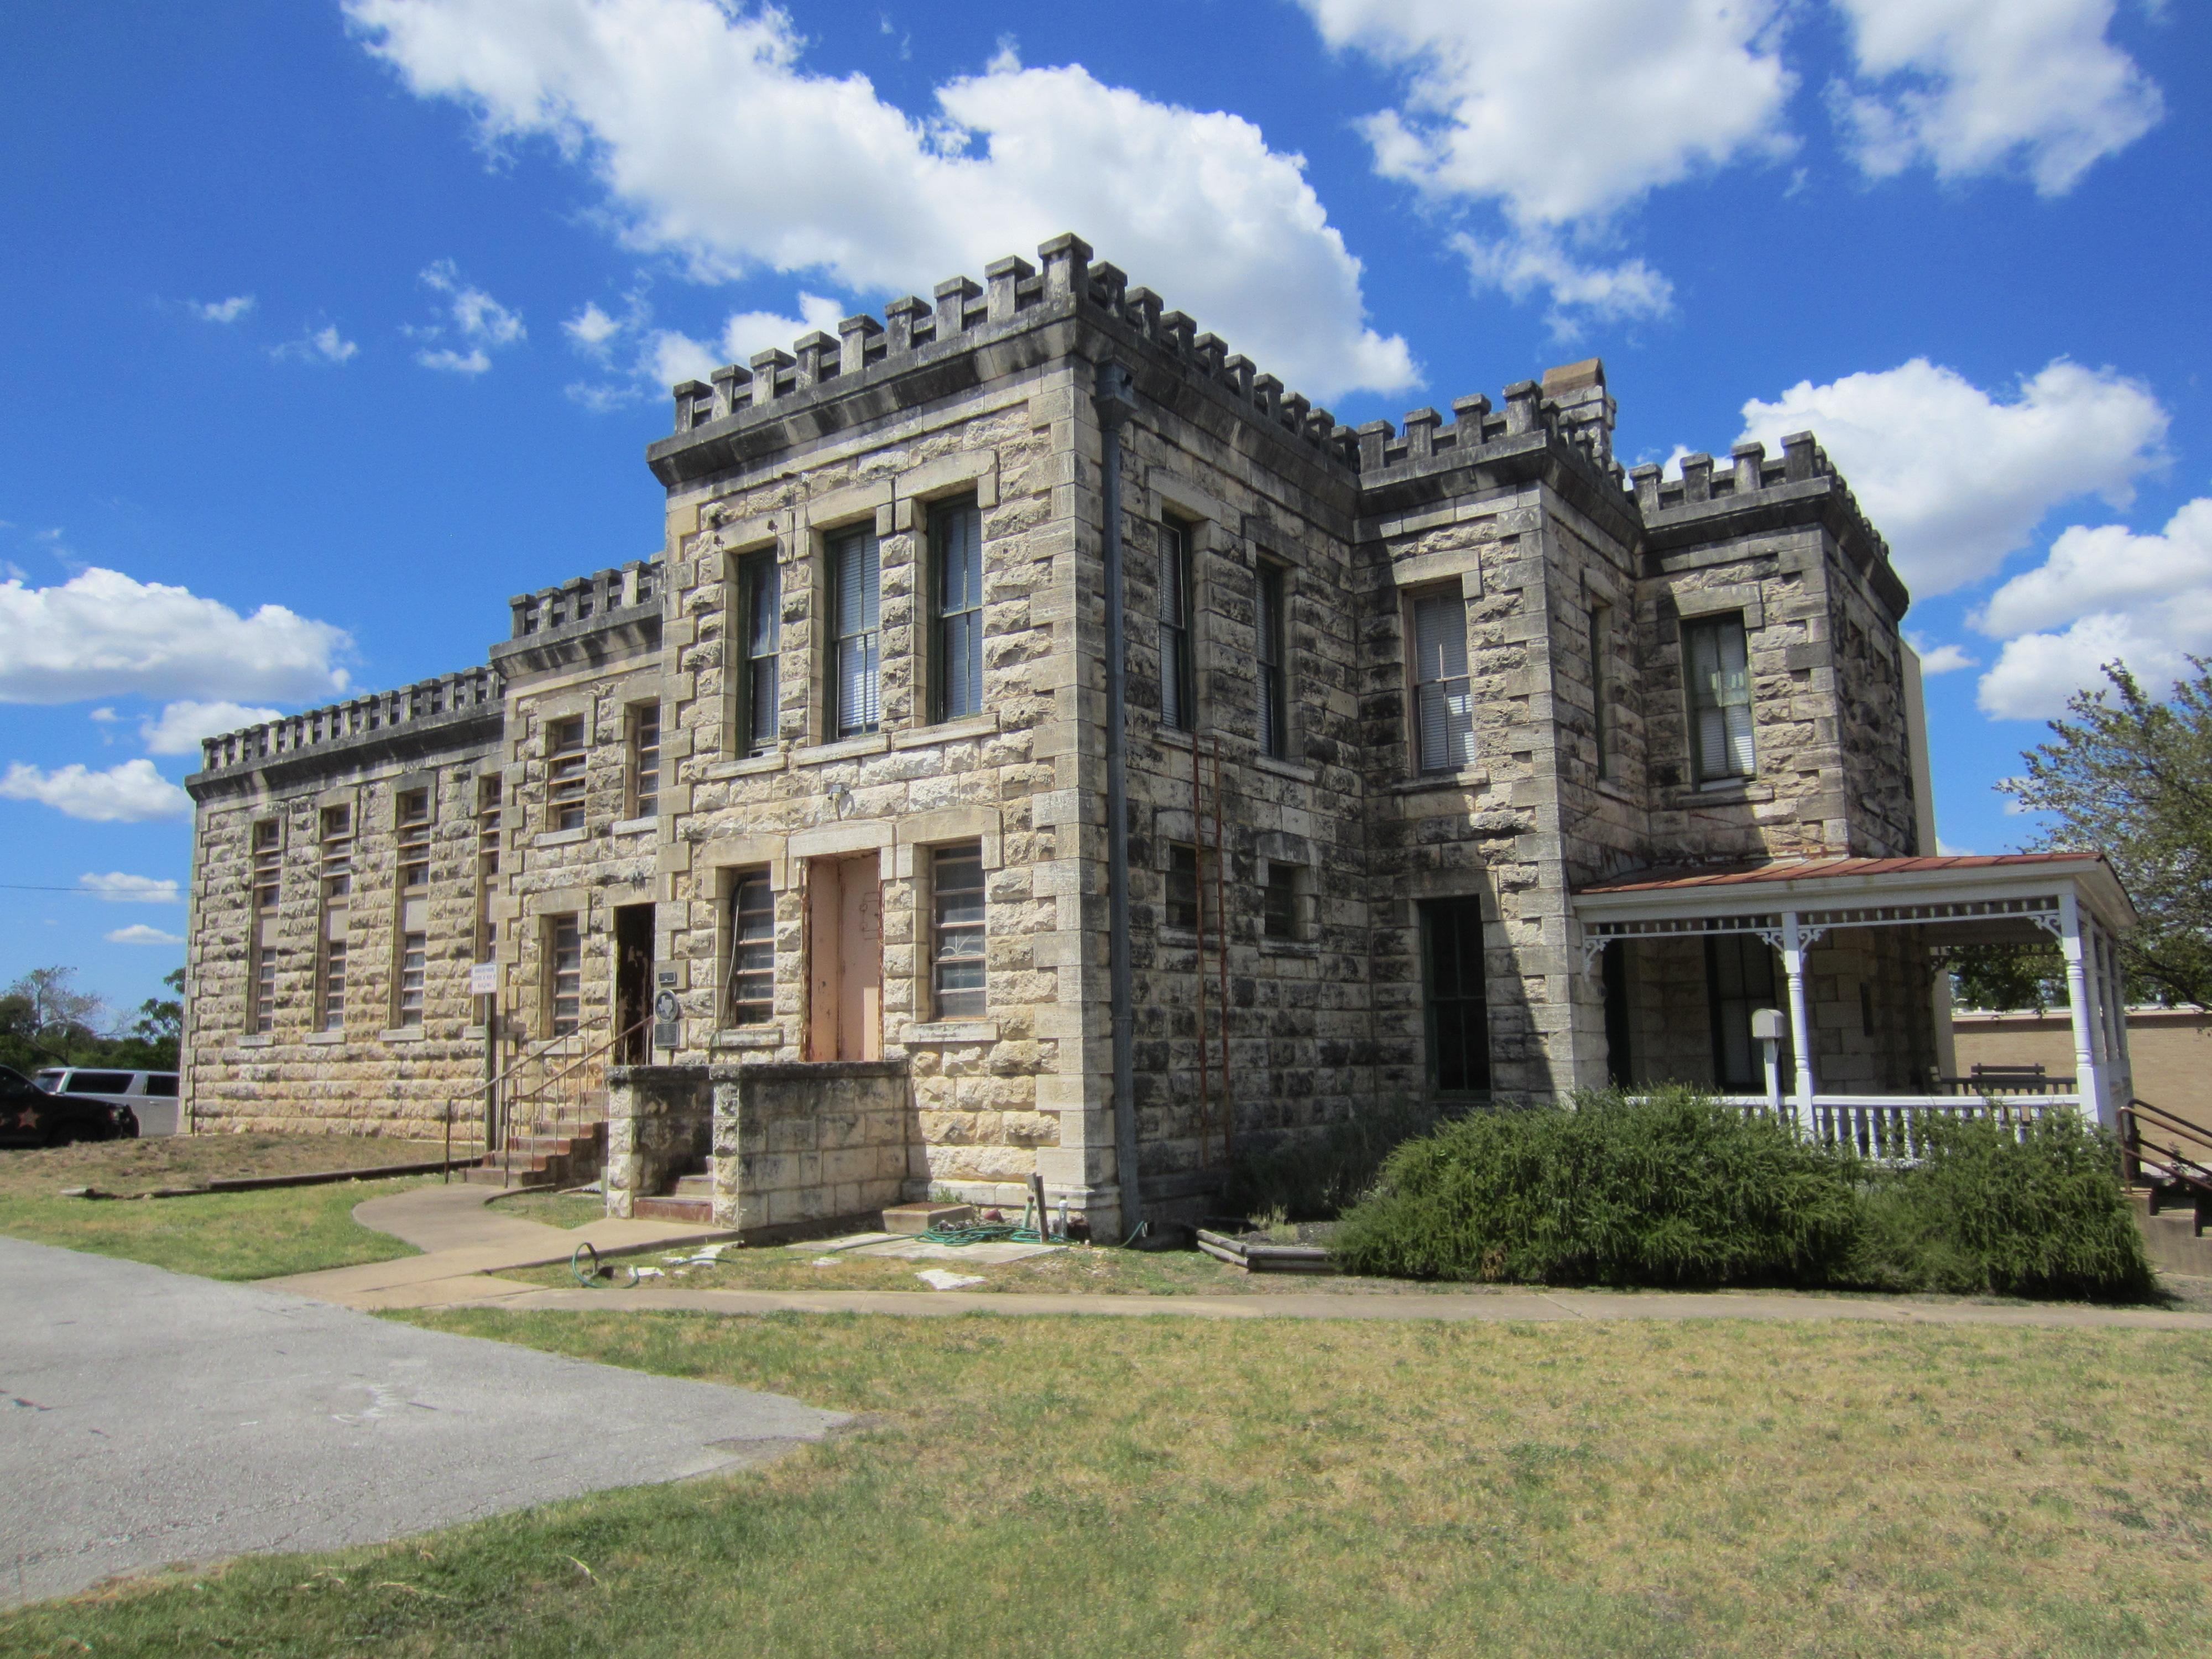 Williamson County Jail (Texas) - Wikipedia